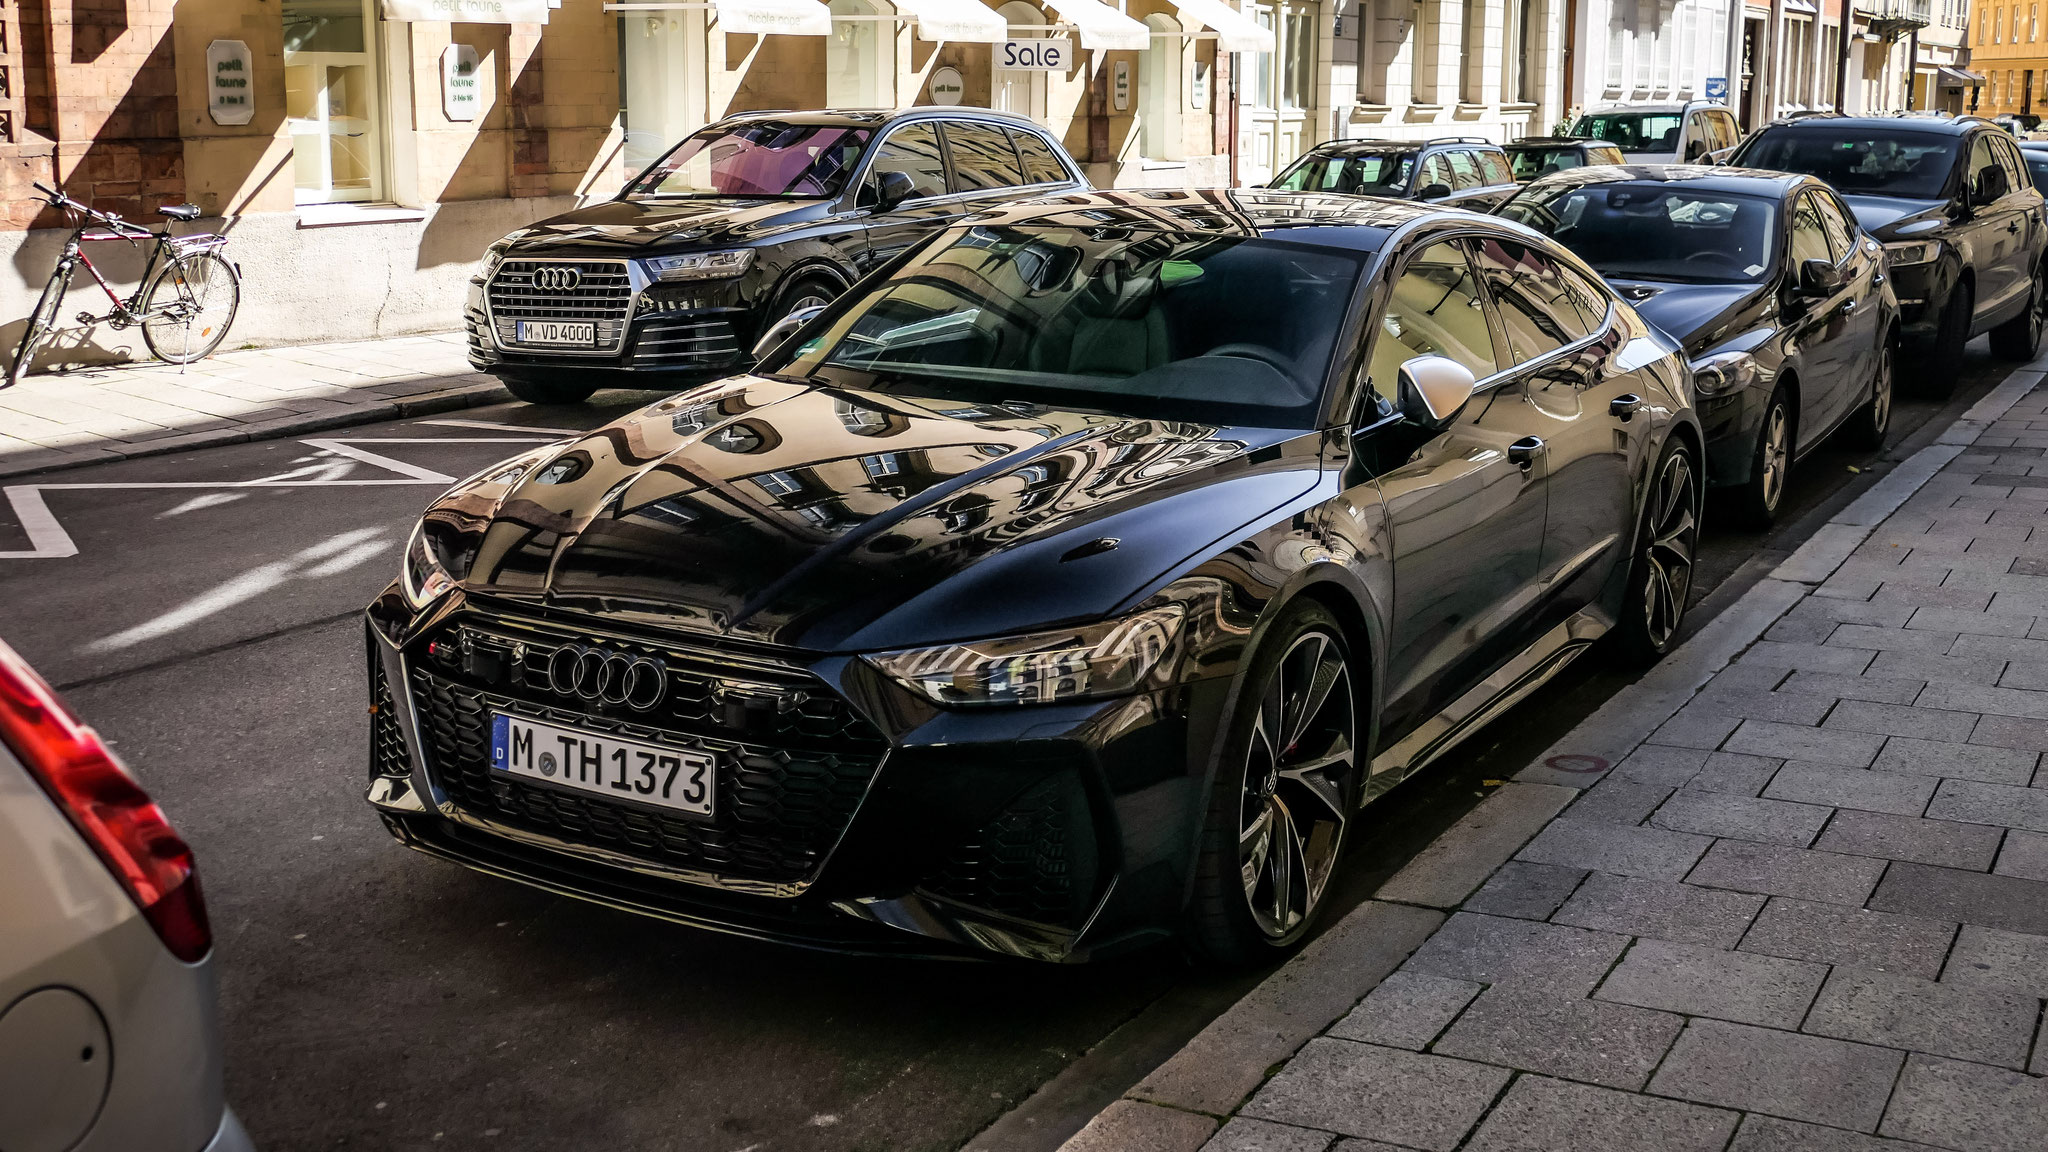 Audi RS7 - M-TH-1373